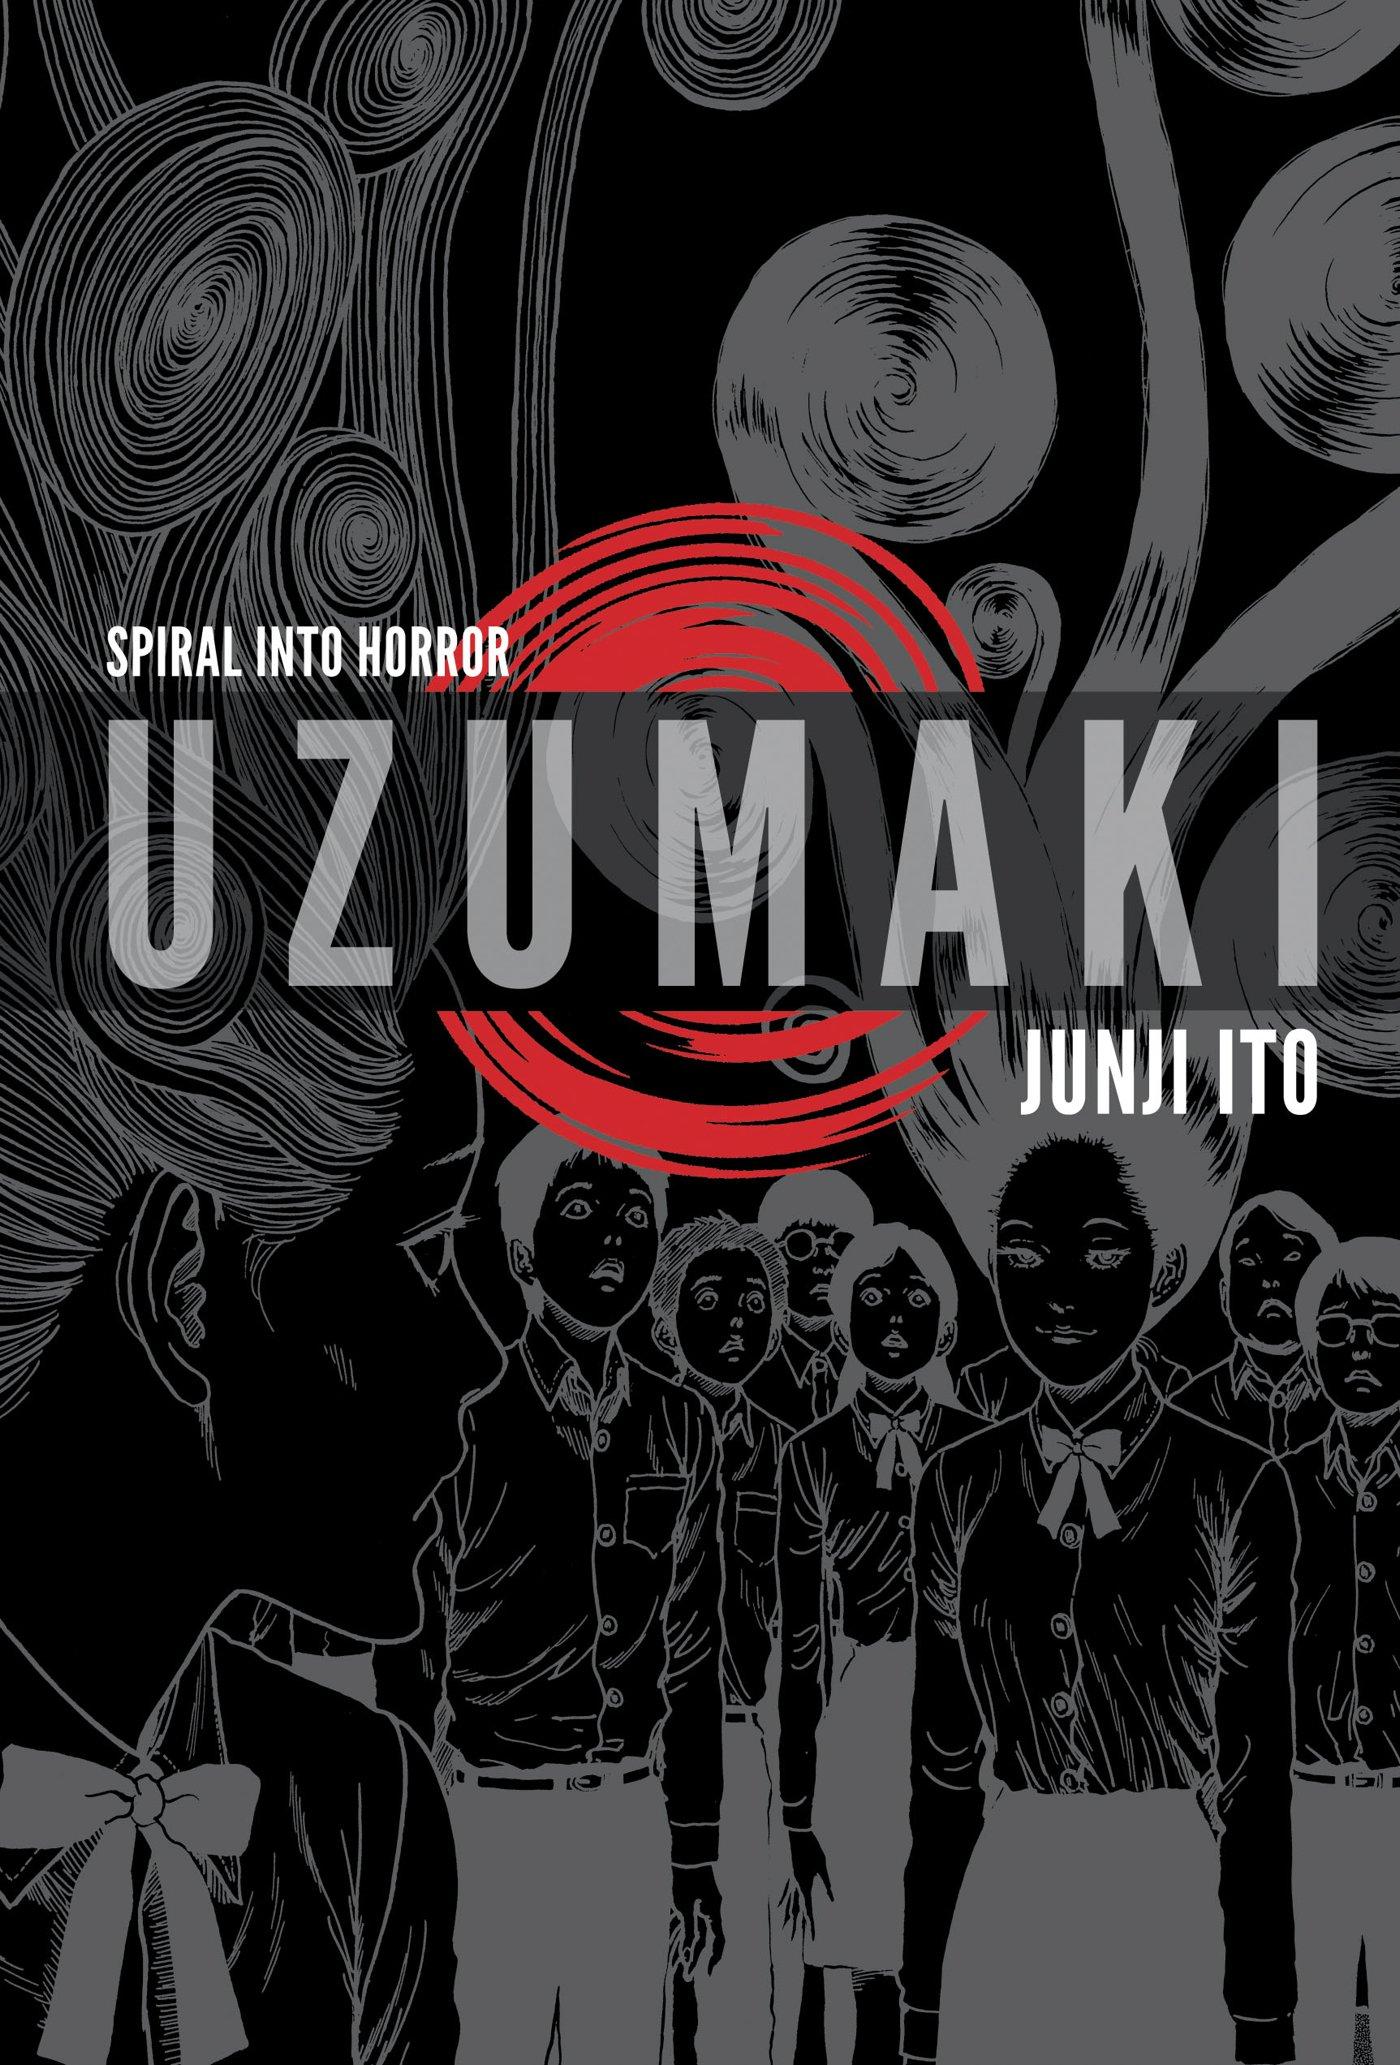 Uzumaki book cover